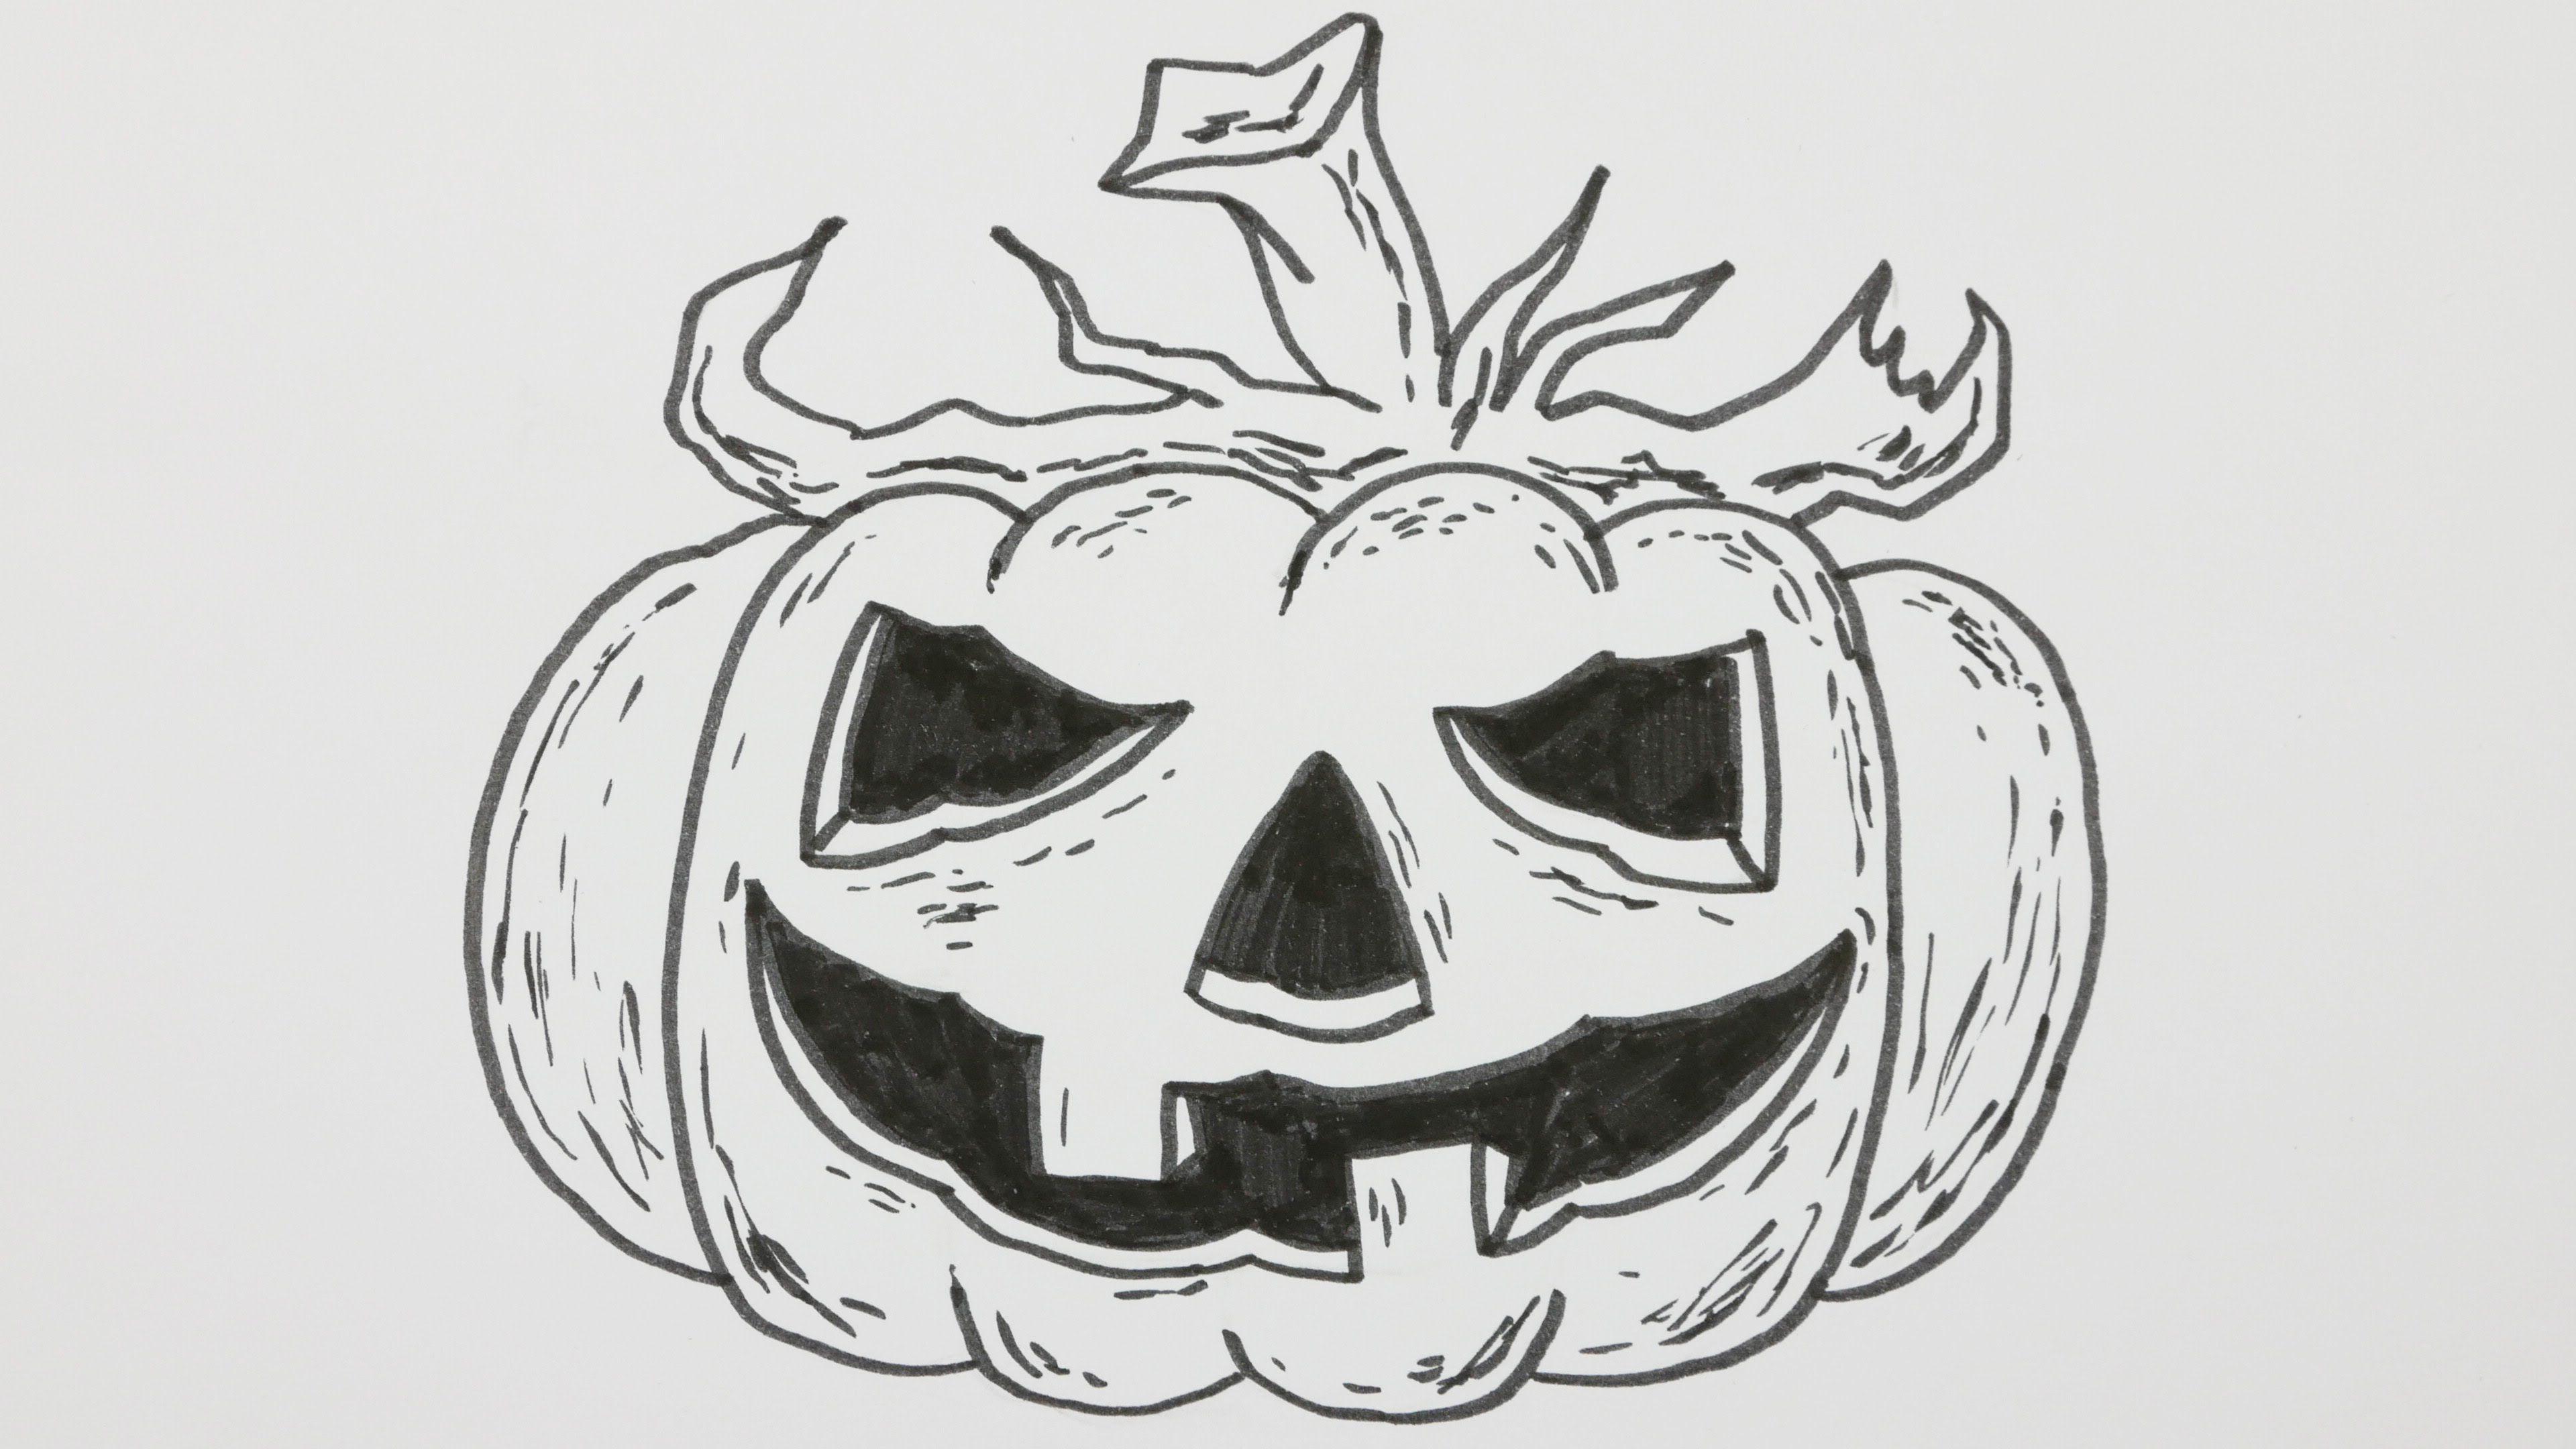 Открытка хэллоуин карандашом, пацан нет пацана